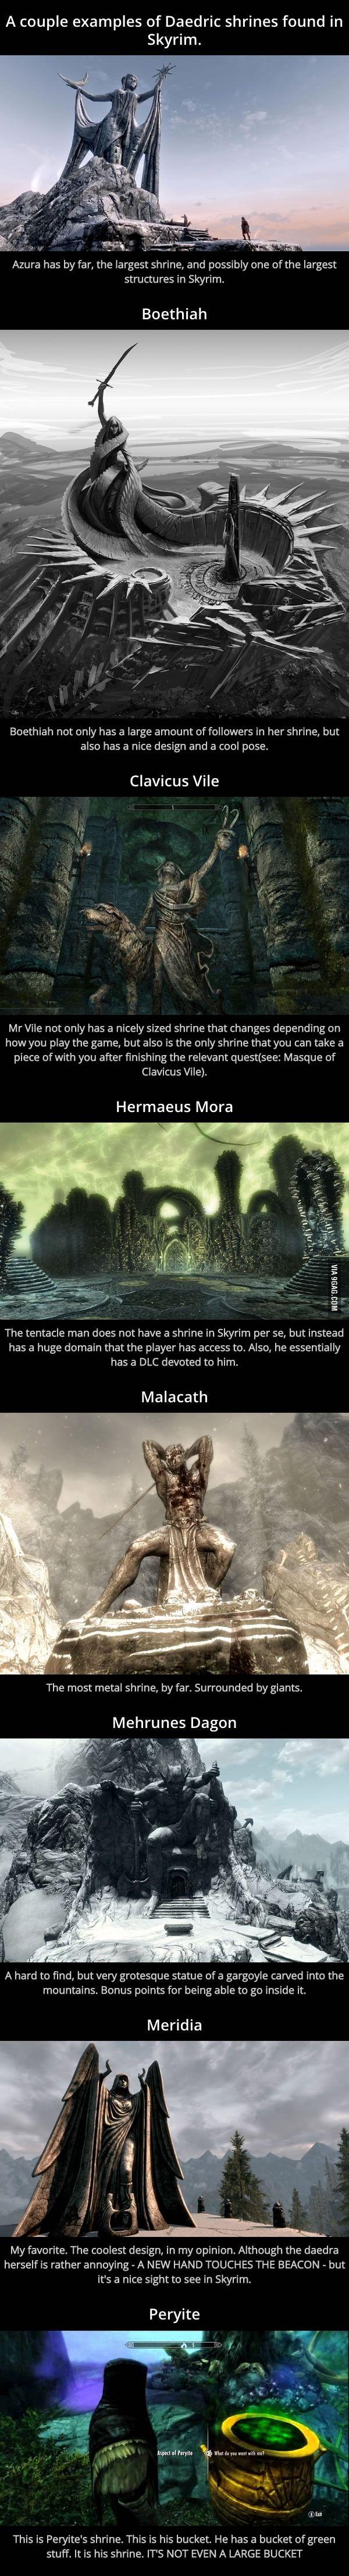 Why Peryite is the Worst Daedric Prince in Skyrim: Shrine Analysis